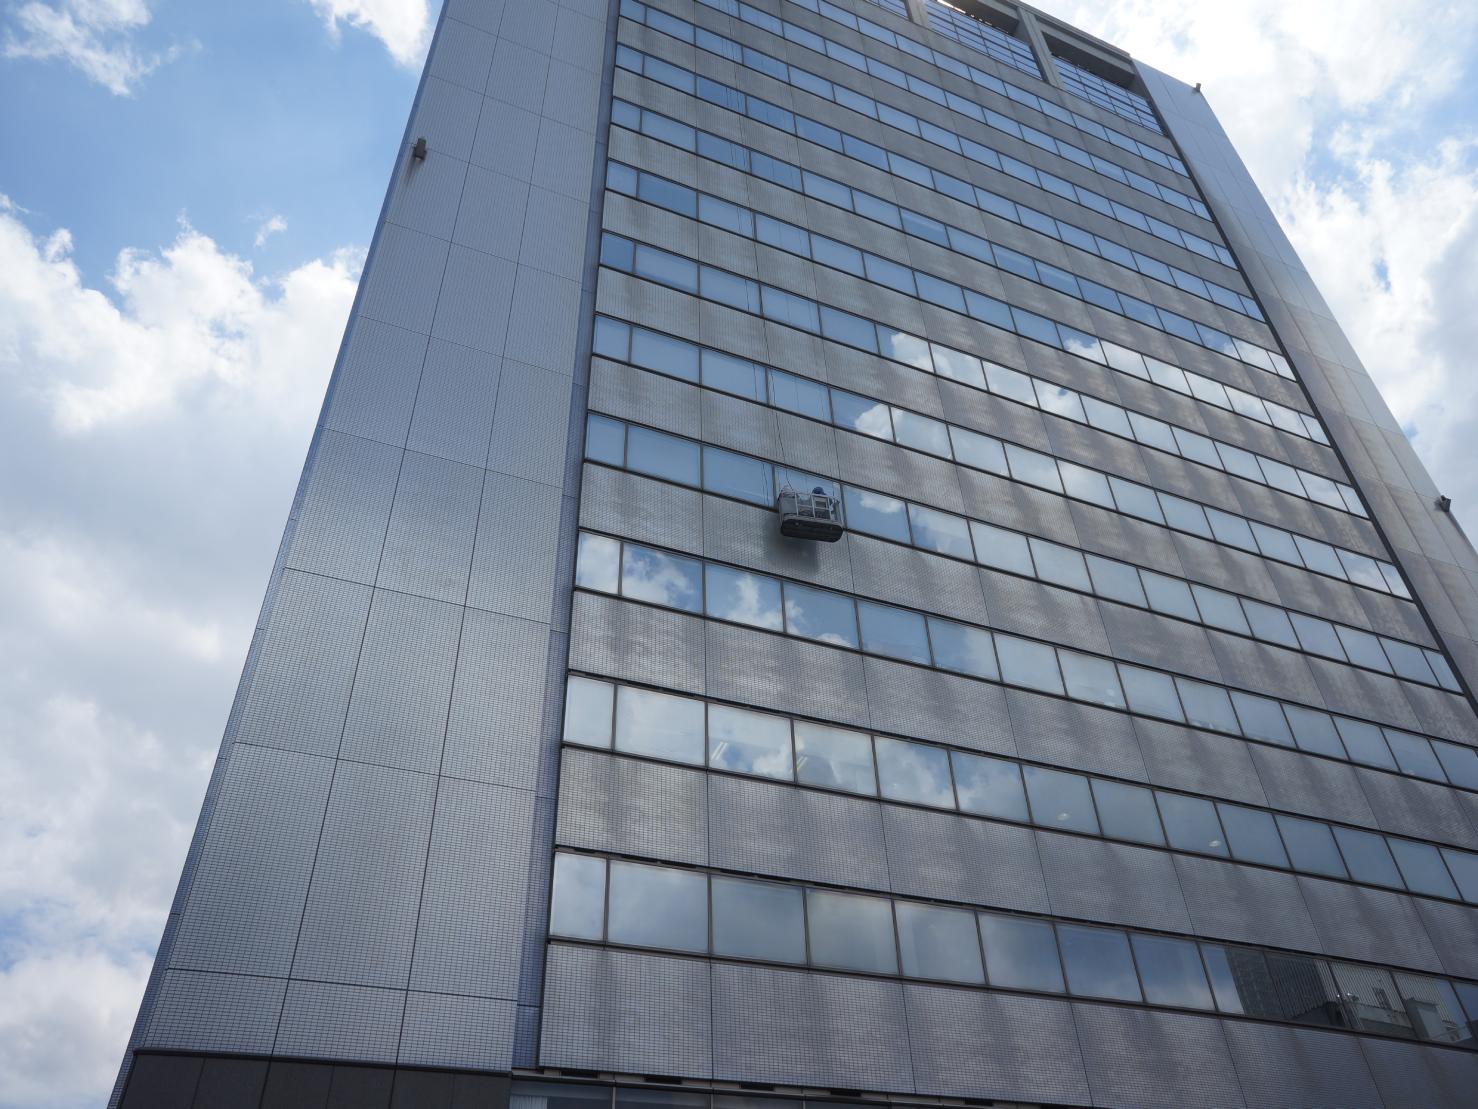 神奈川県 高等学校 15階建 ガラス定期清掃